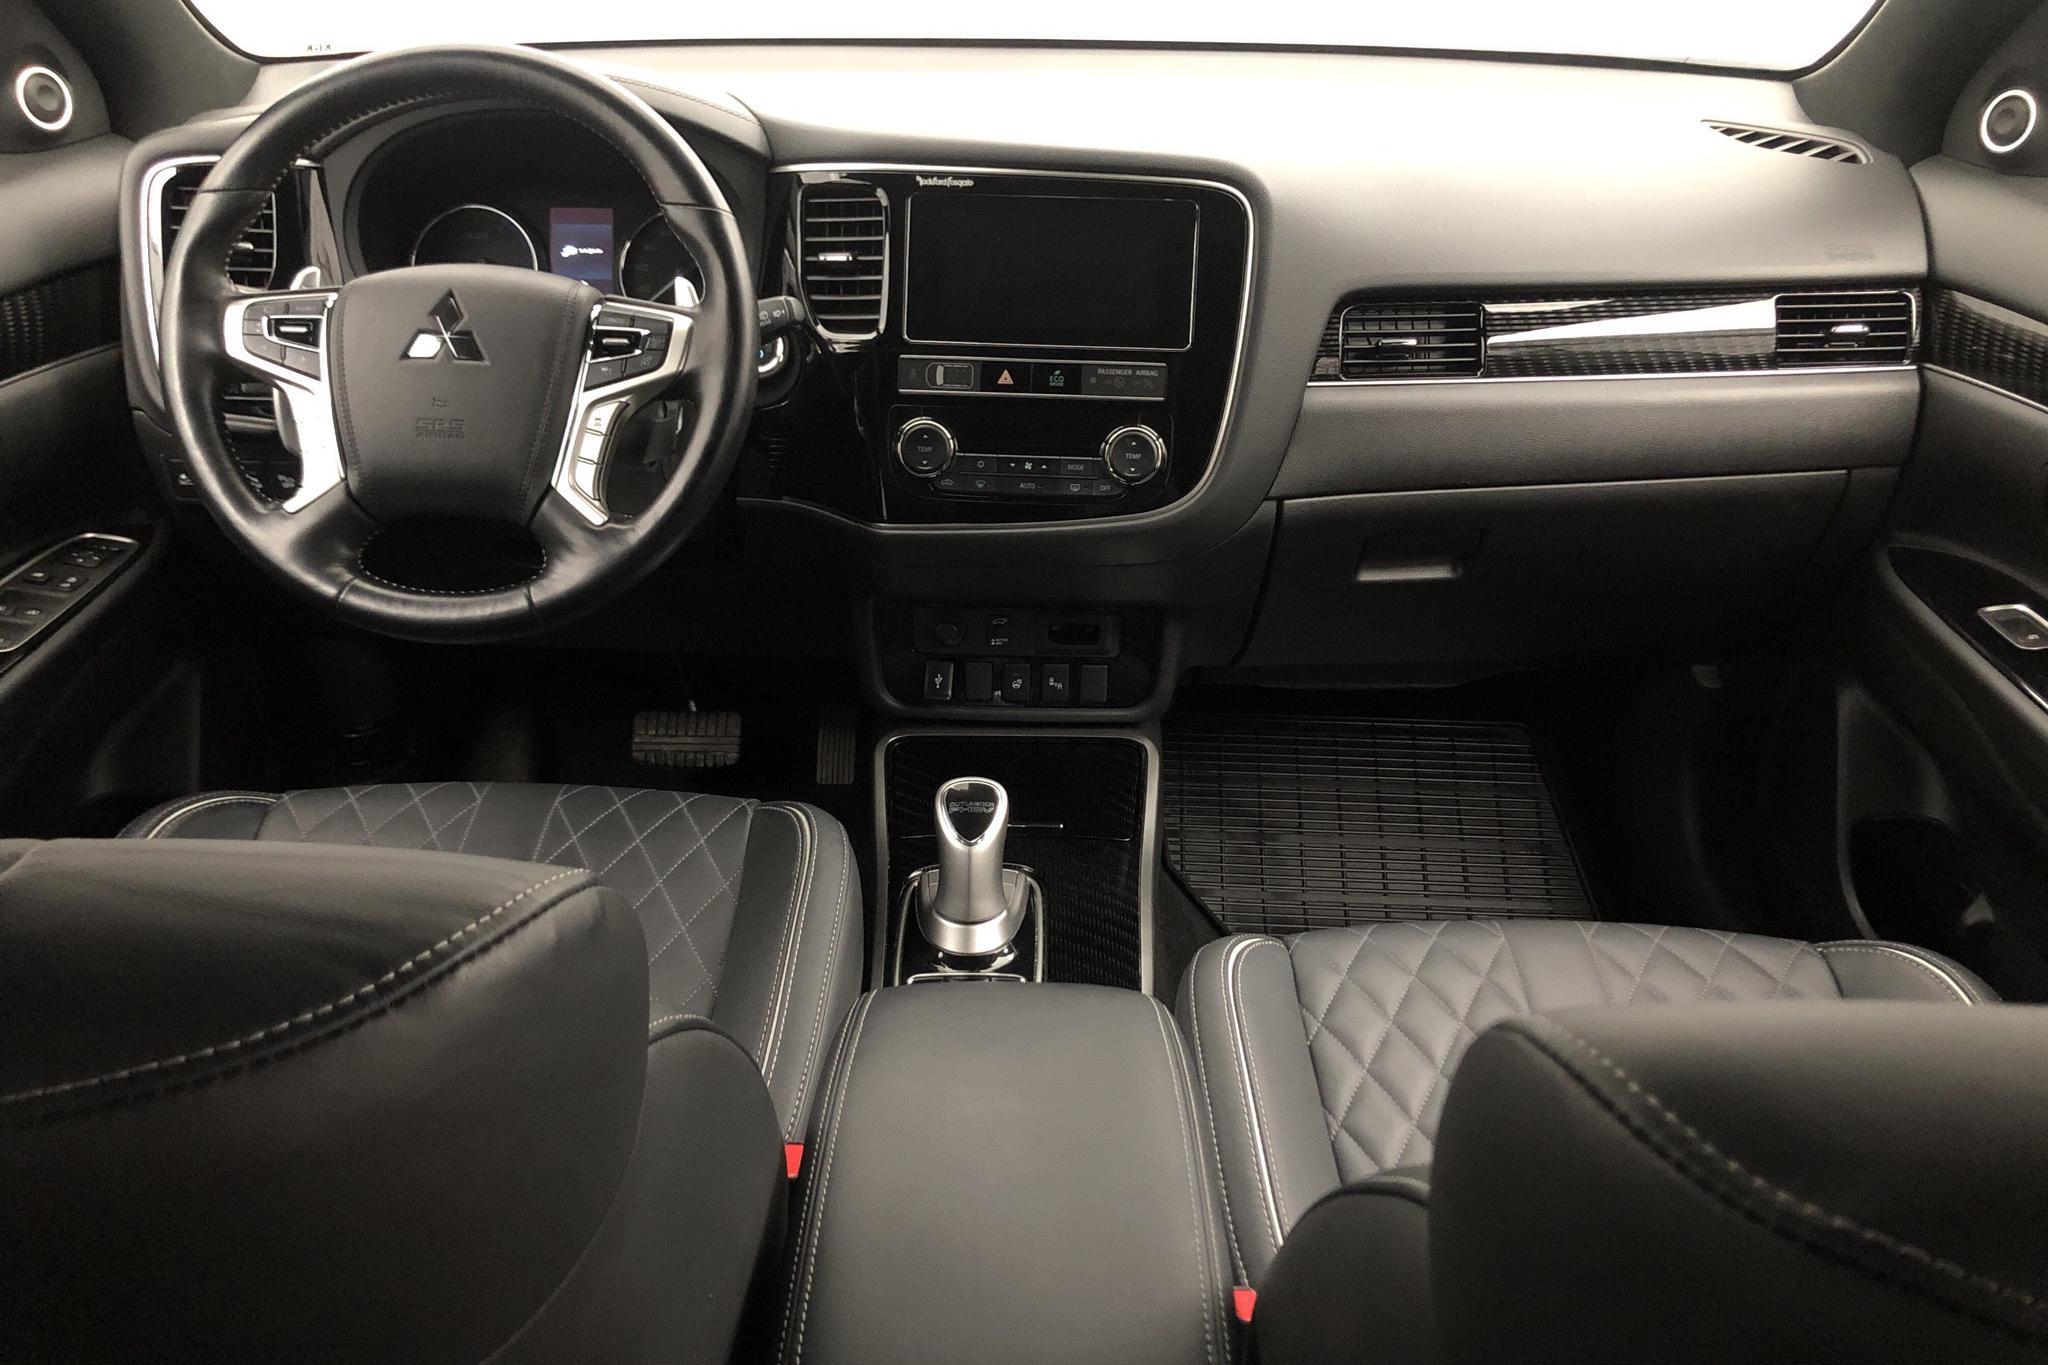 Mitsubishi Outlander 2.4 Plug-in Hybrid 4WD (136hk) - 3 259 mil - Automat - röd - 2019